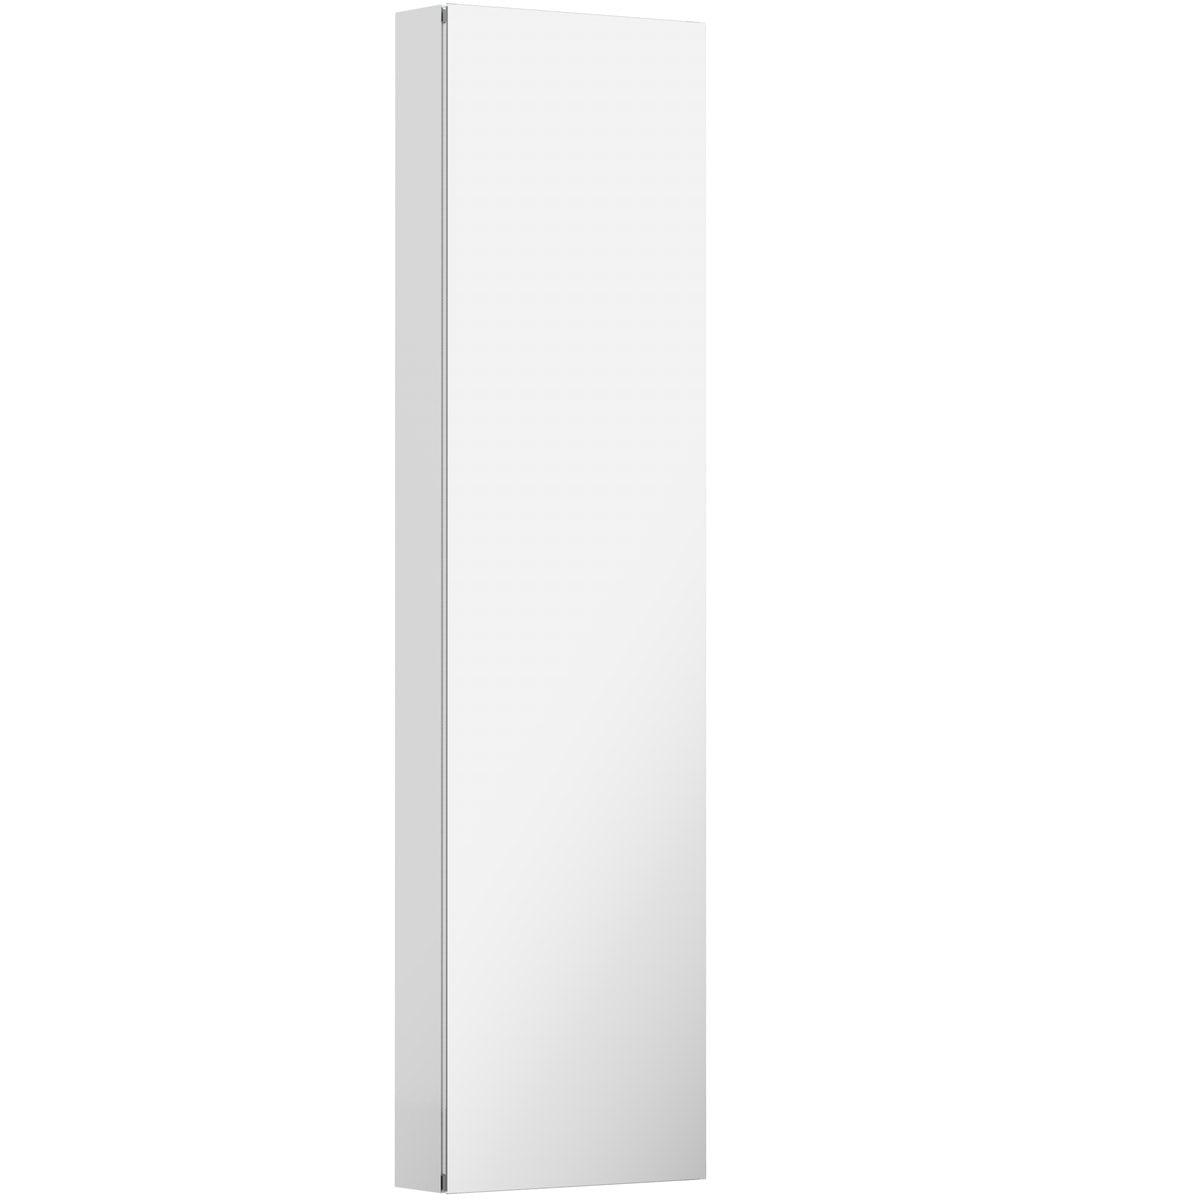 Mode Breuer tall mirror cabinet 1500 x 400